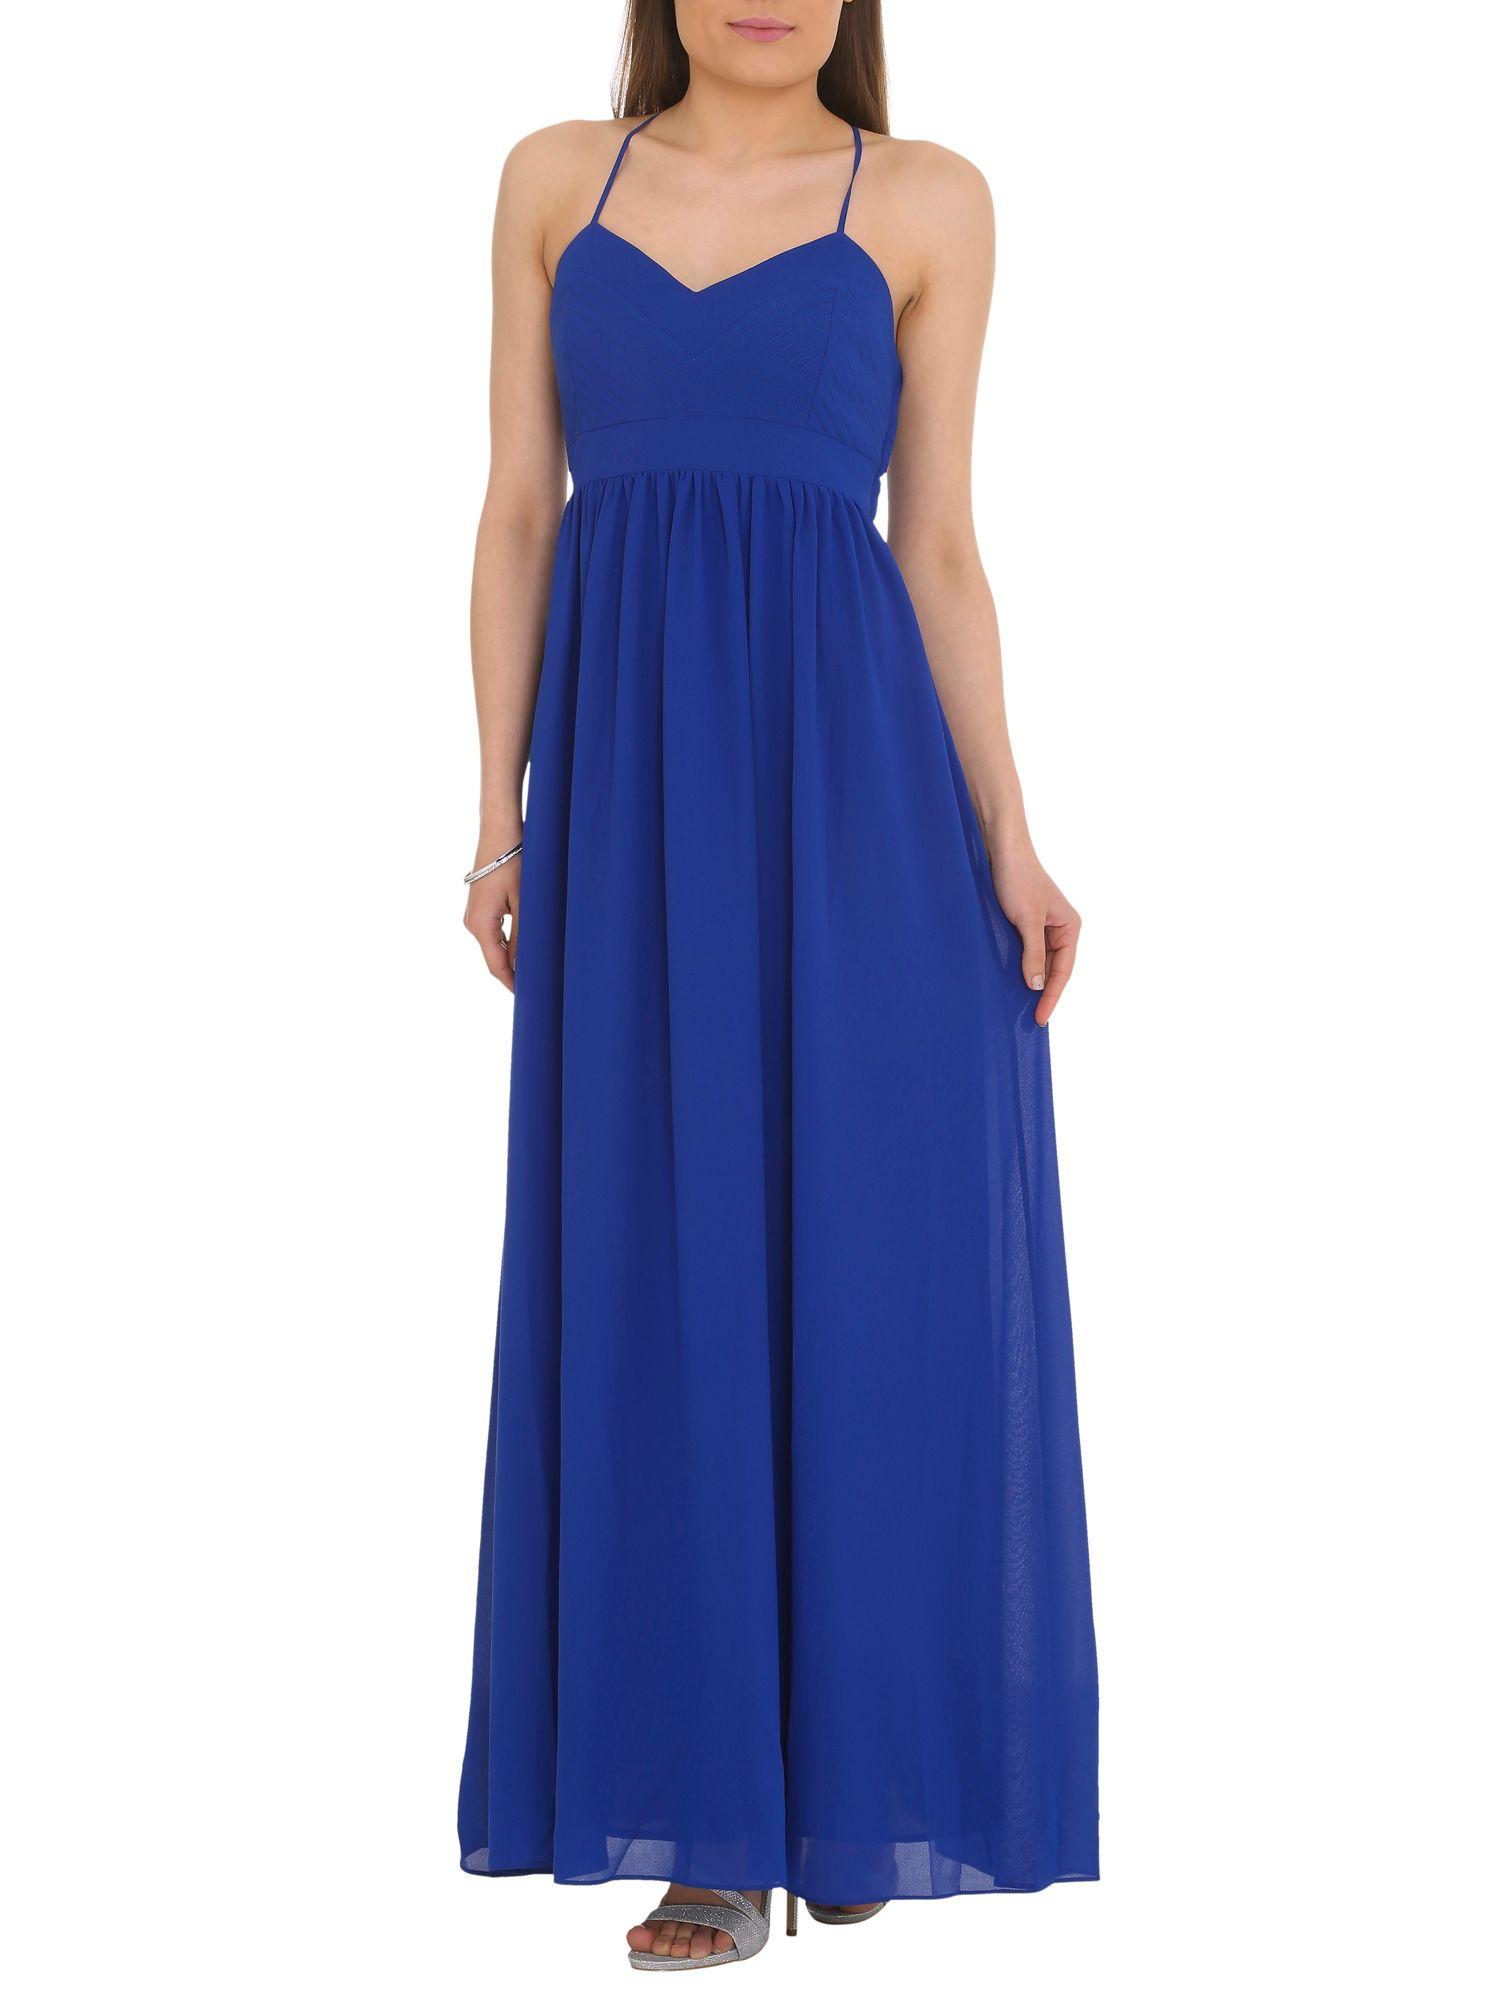 Badgley mischka Chiffon Maxi Dress in Blue (Cobalt) | Lyst